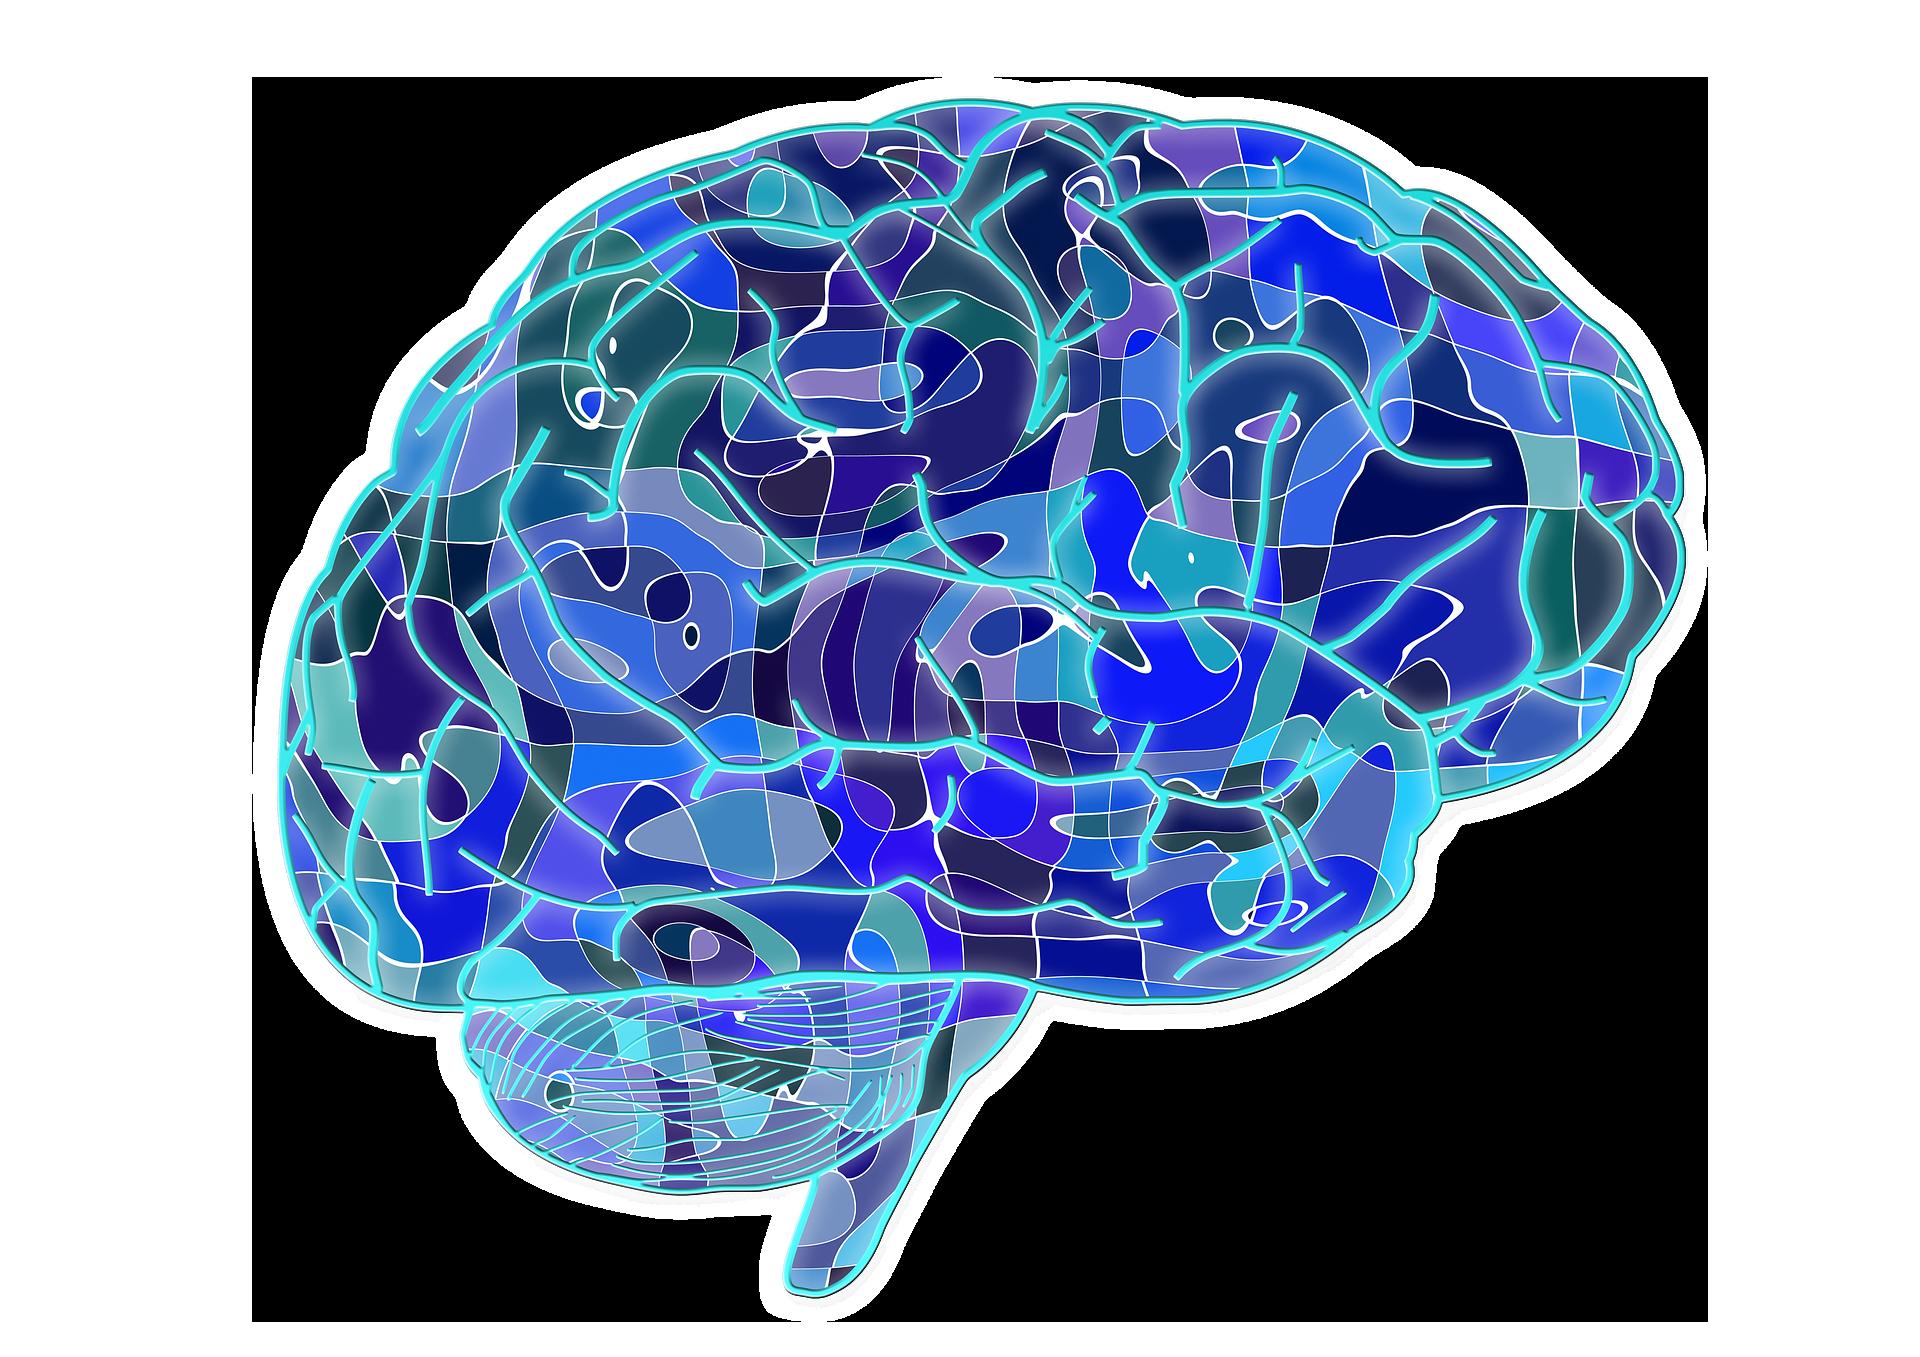 Png transparent images pluspng. Knowledge clipart psychology brain